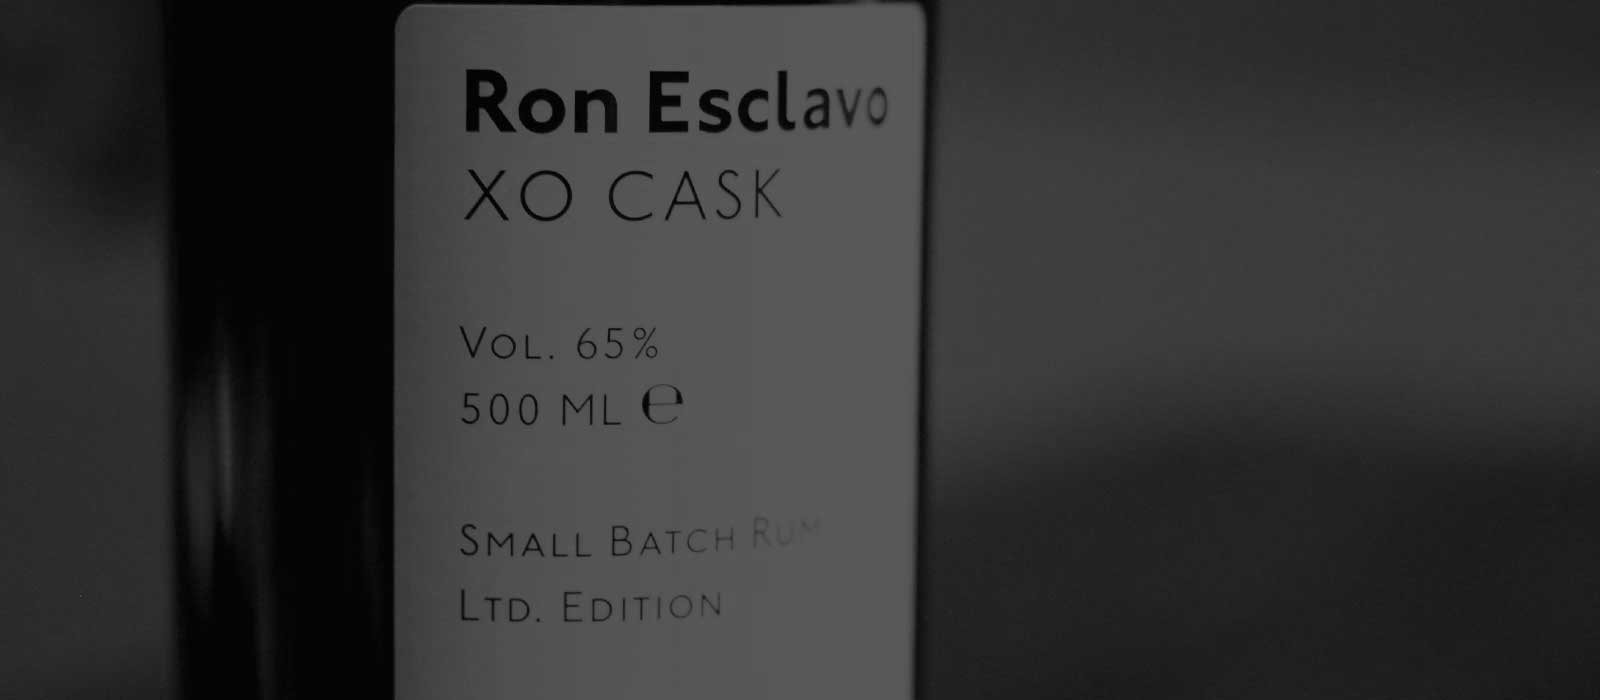 Guld 2015: Ron Esclavo XO Cask